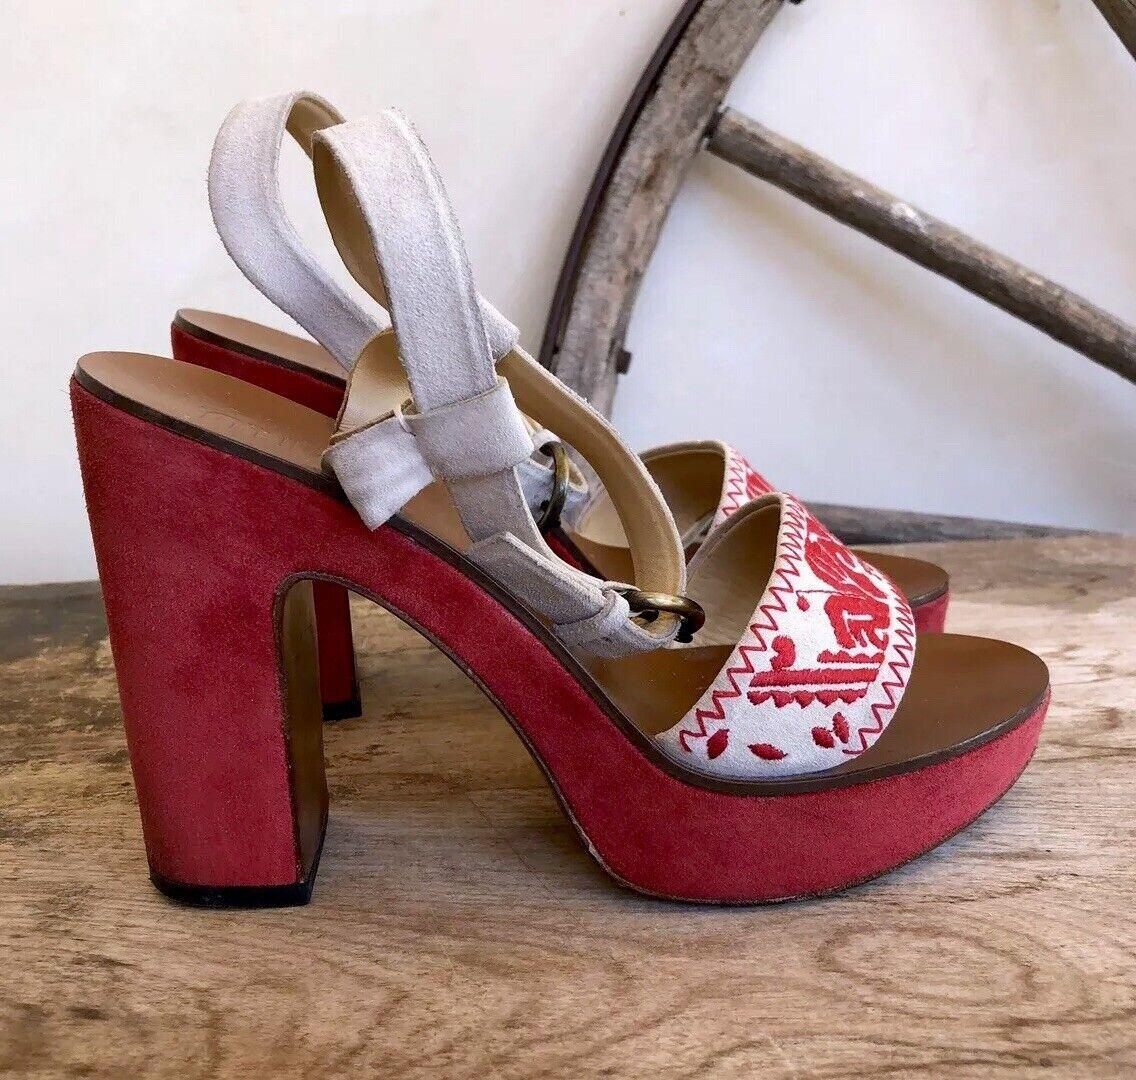 MIU MIU PRADA Red Southwestern Embroidered Suede Leather Platform Heels